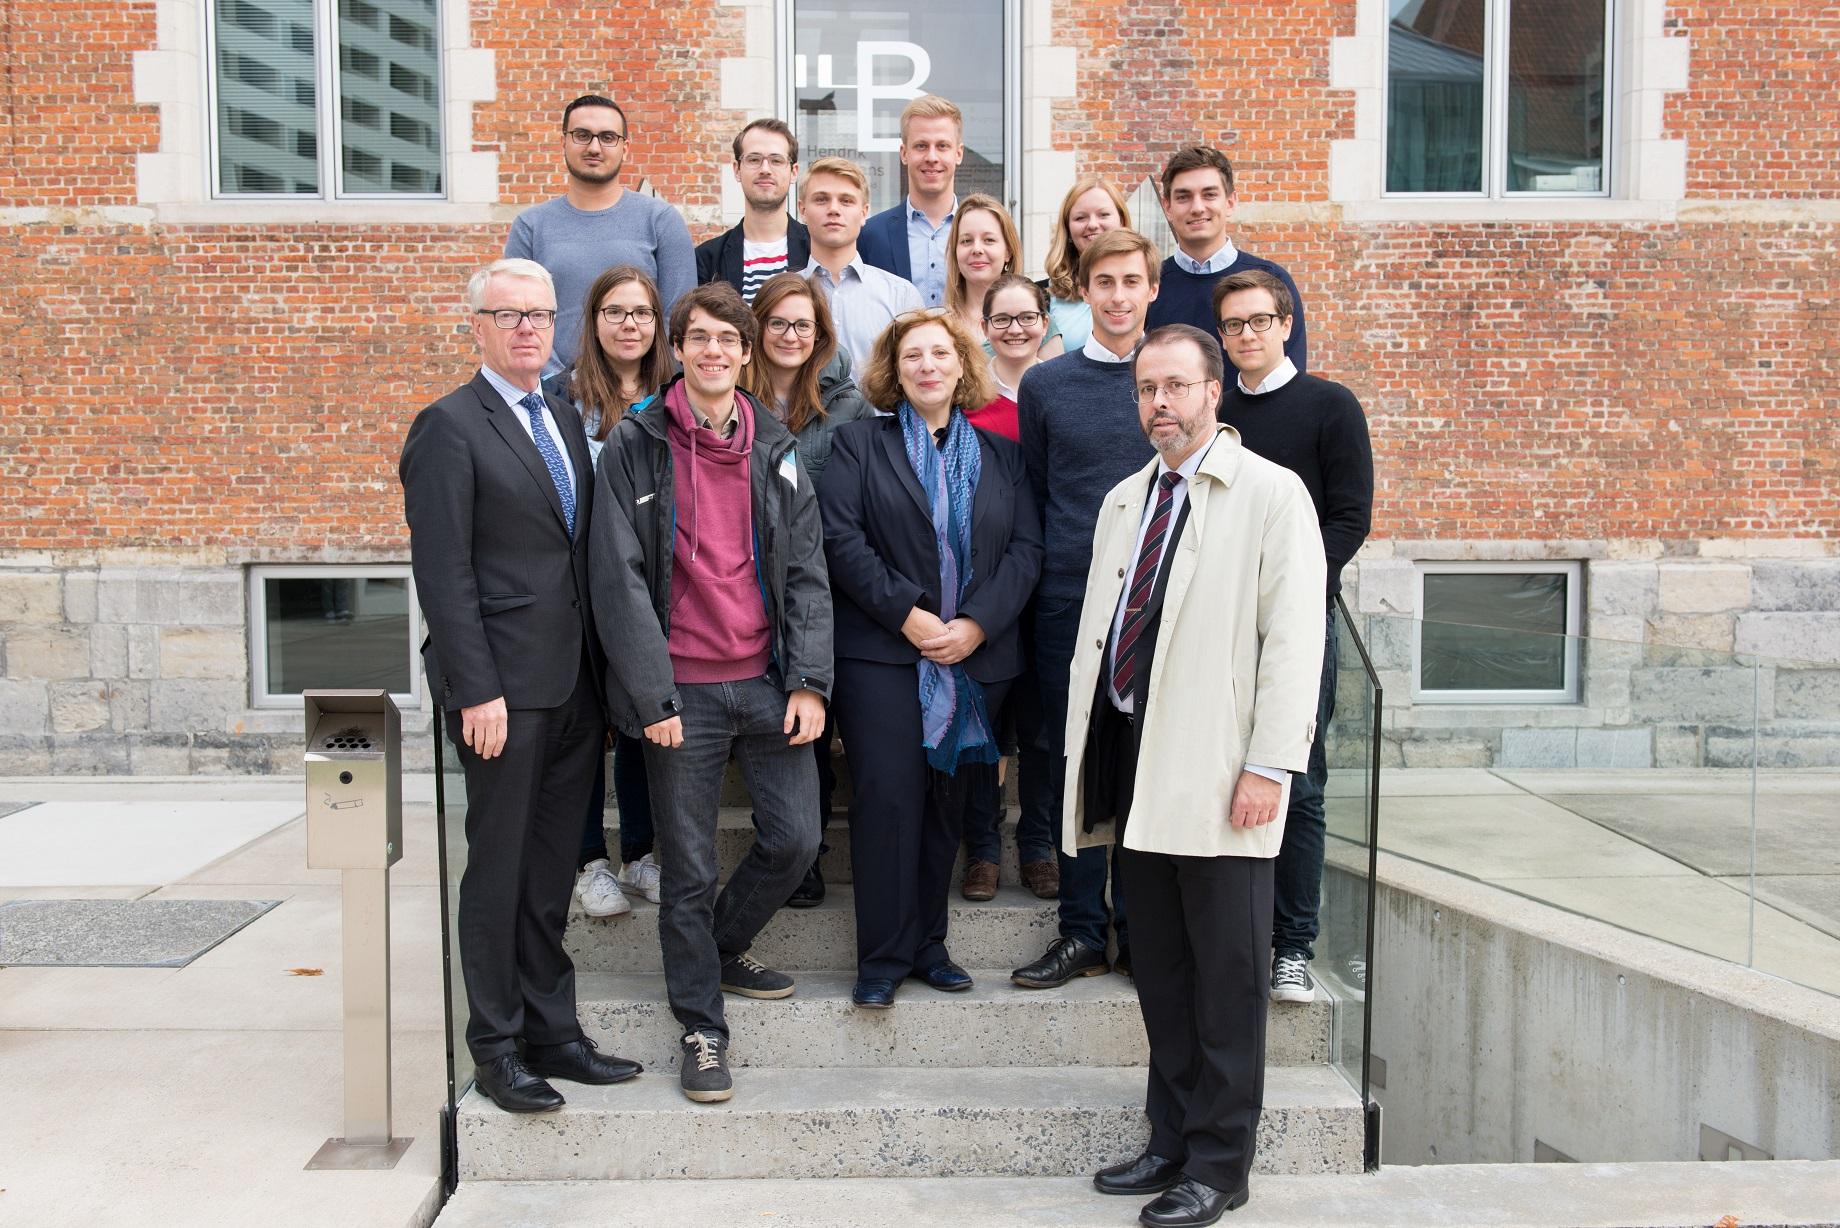 Dr. Daniela De Ridder mit Botschafter Rüdiger Lüdeking am 'College of Europe' (Foto - Stéphanie Parmentier)